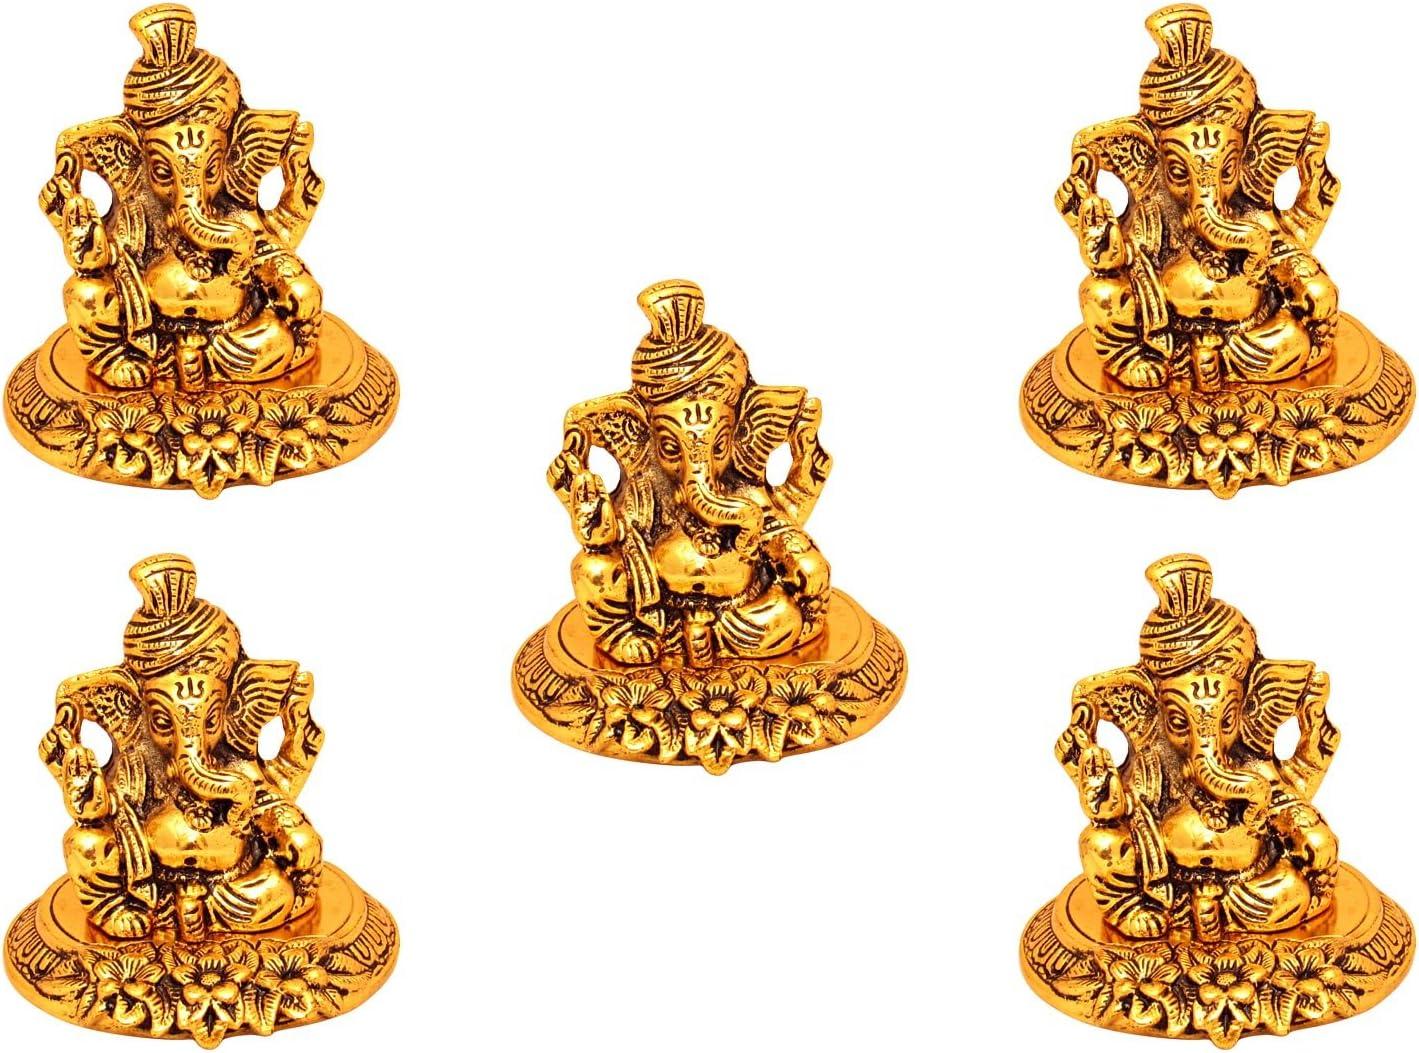 GoldGiftIdeas Oxidized Gold Plated Paghdi Ganesha Idol for Gift, Return Gift for Indian Festival, Ganpati Idol for Pooja, Decorative Worship Idol, Home Decor Gift Item (Pack of 5)